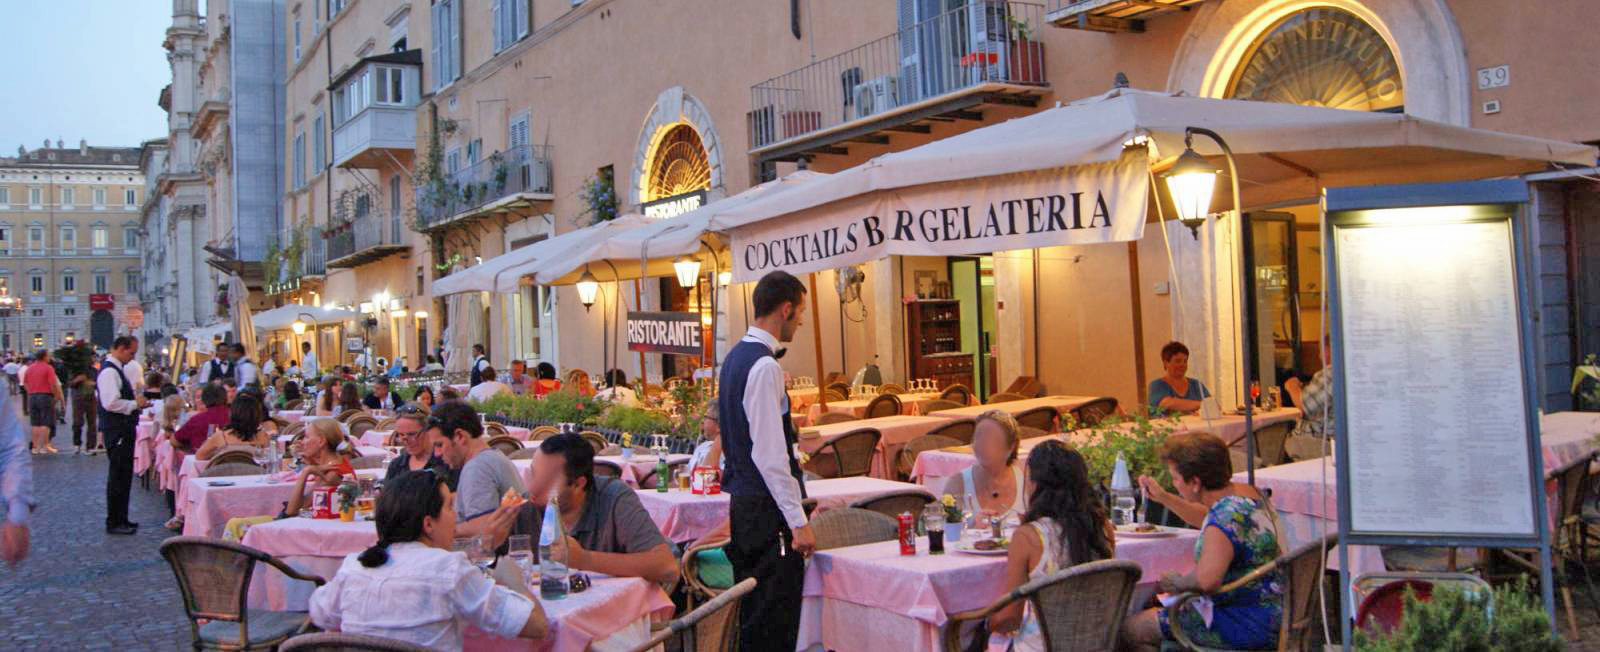 Oda a la romana una semana a la italiana en buenos aires for Semana del diseno buenos aires